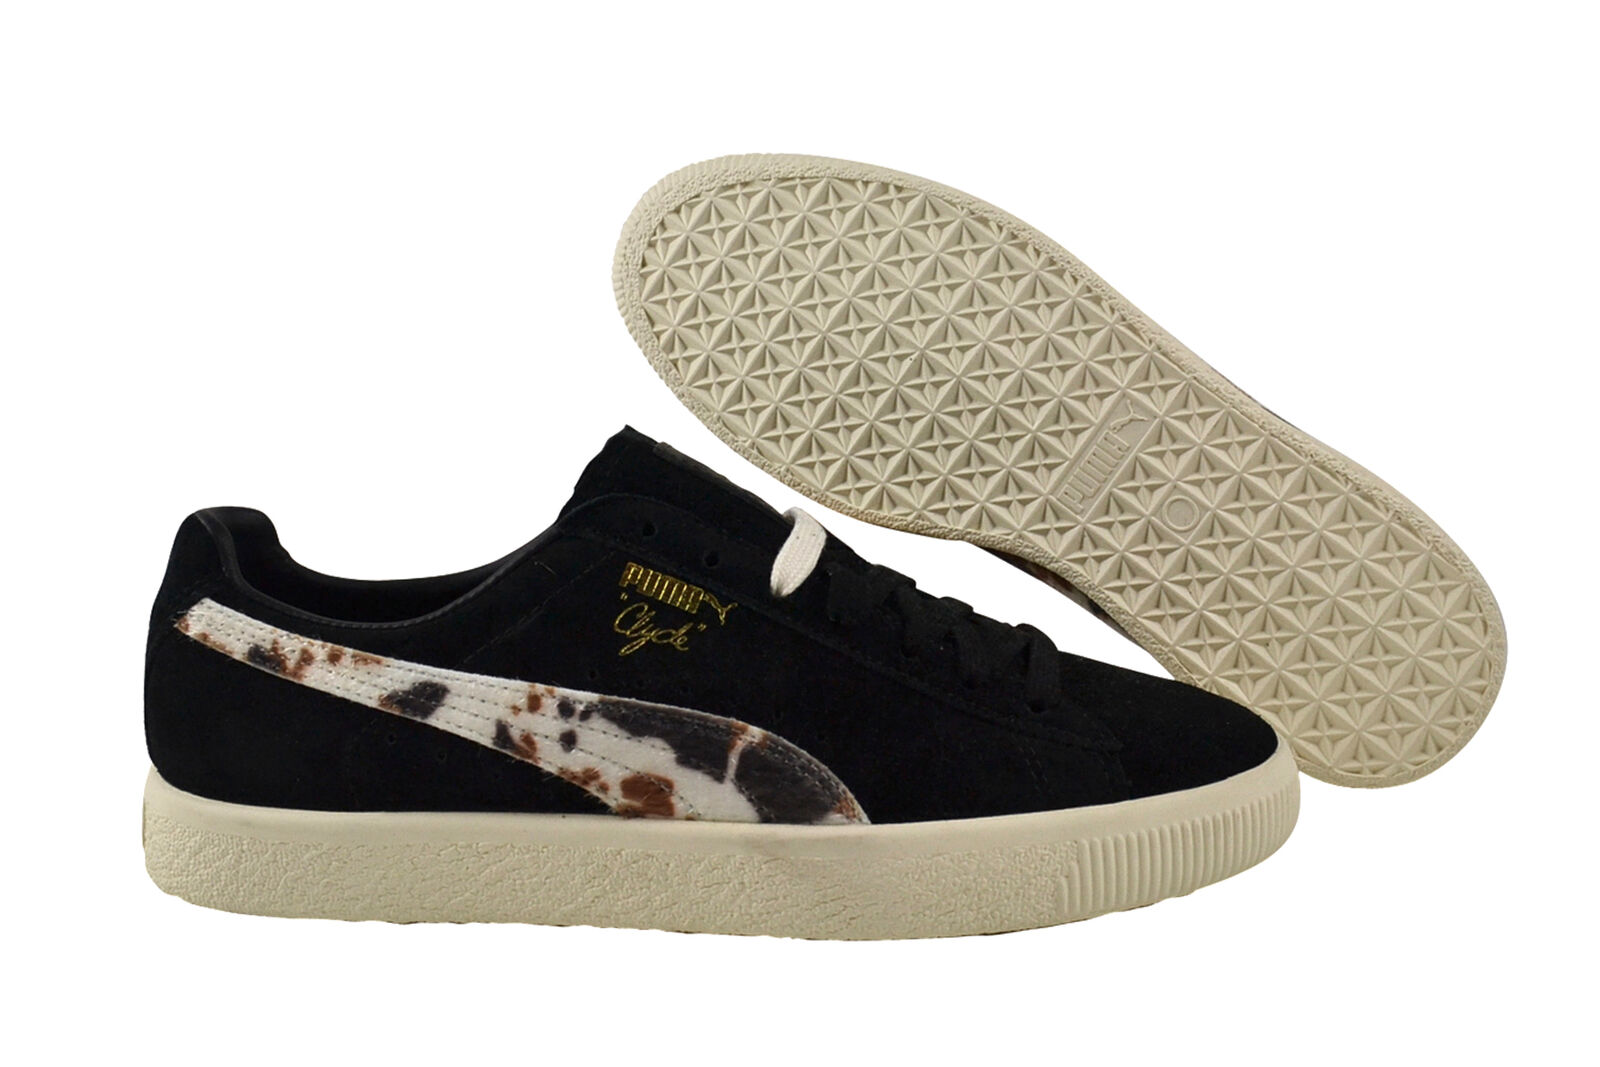 Puma Clyde X Packer black/white Sneaker/Schuhe schwarz 363507 01